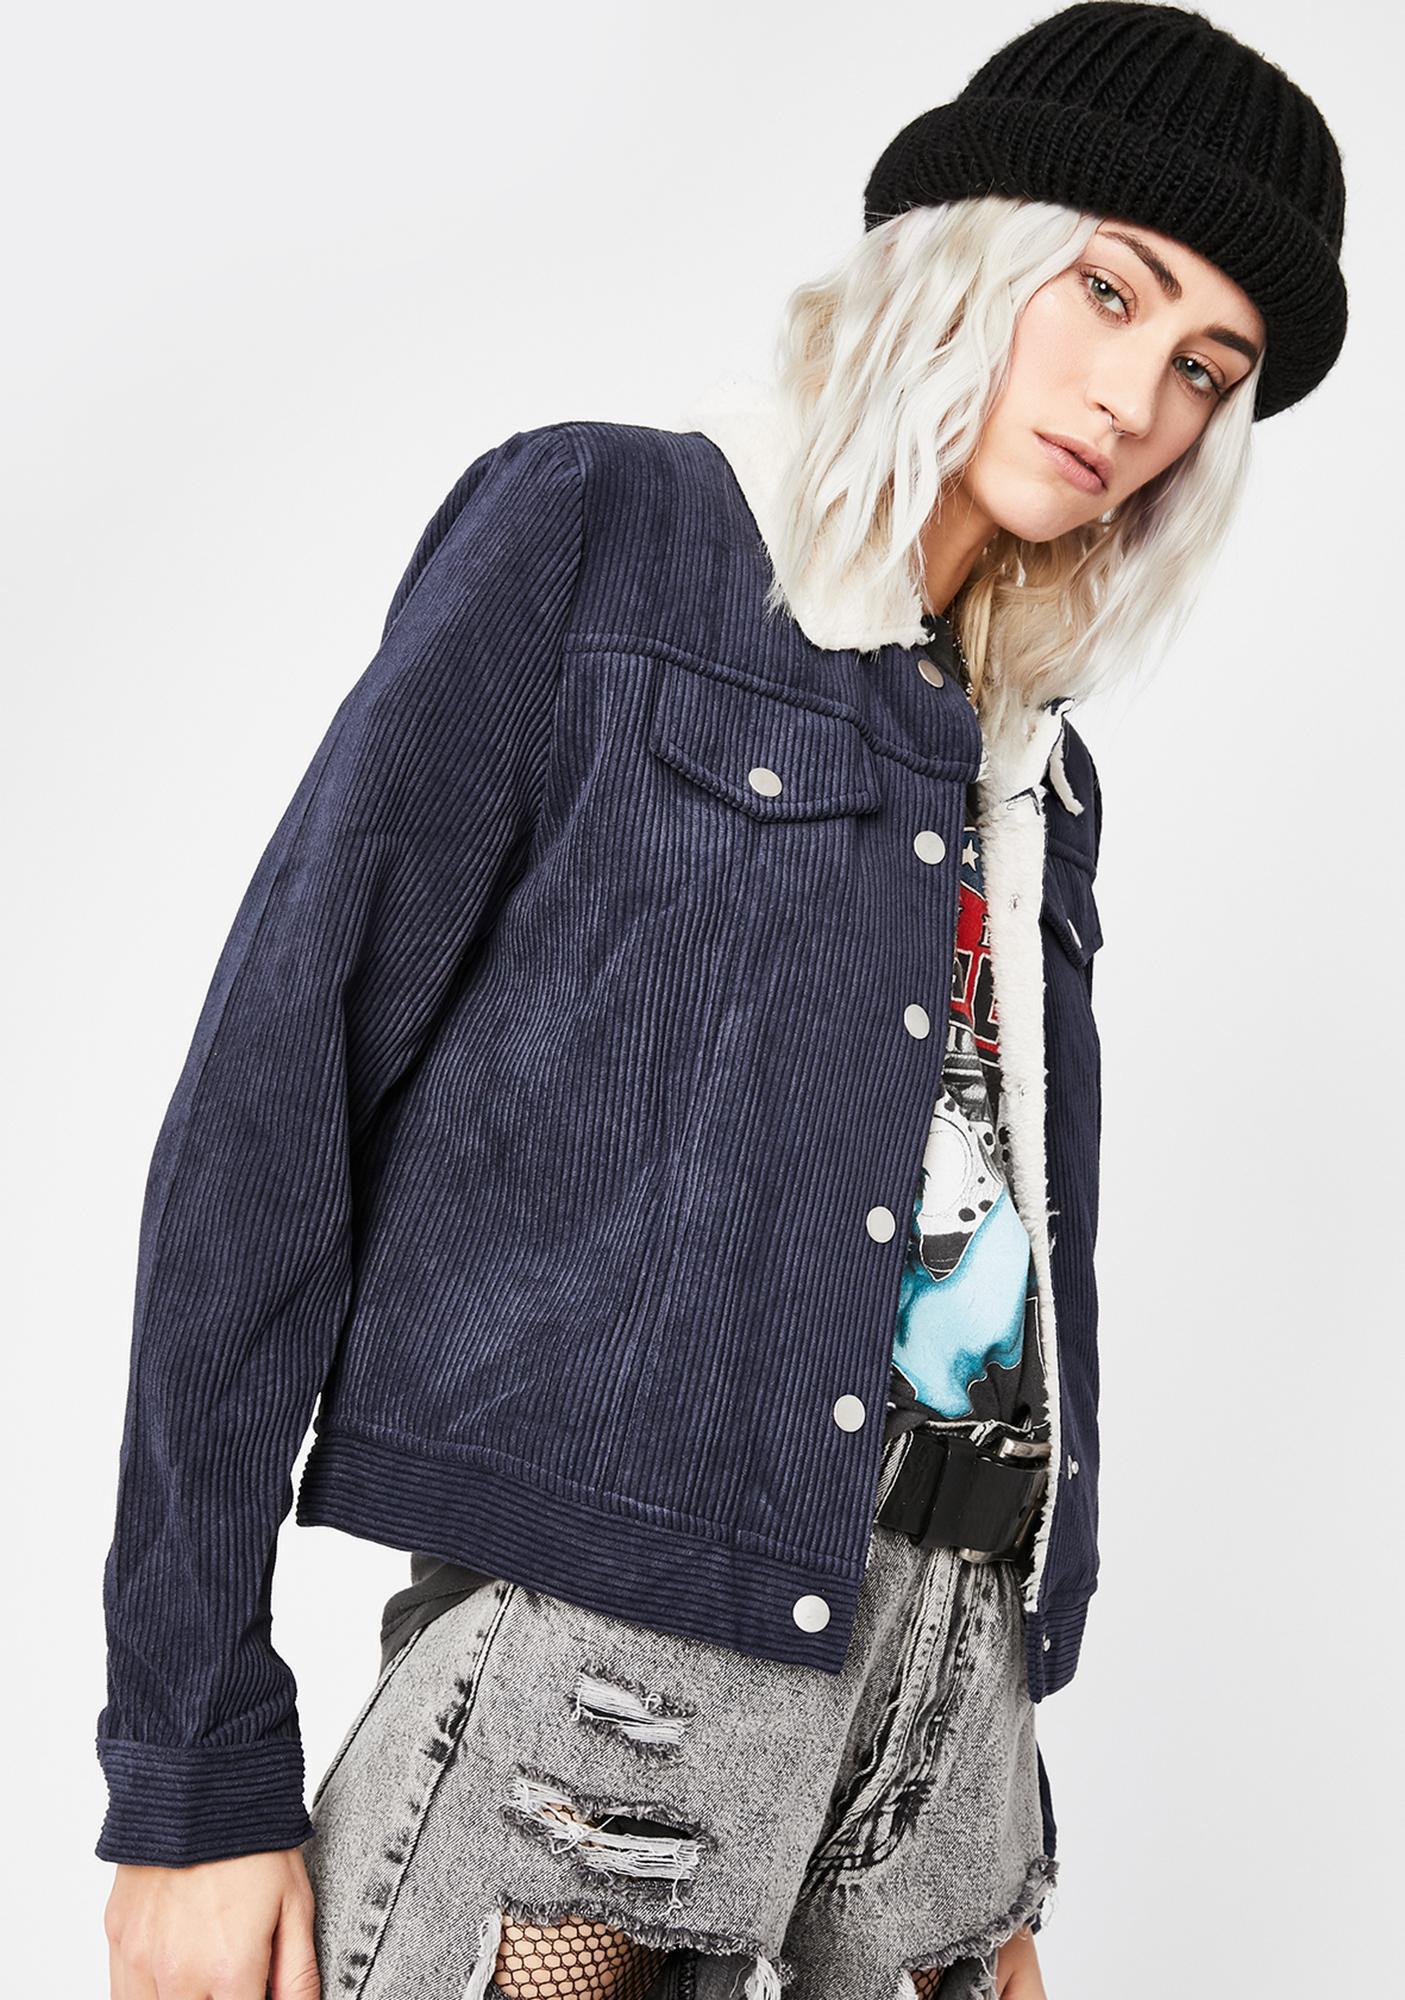 Cool N' Collected Corduroy Jacket